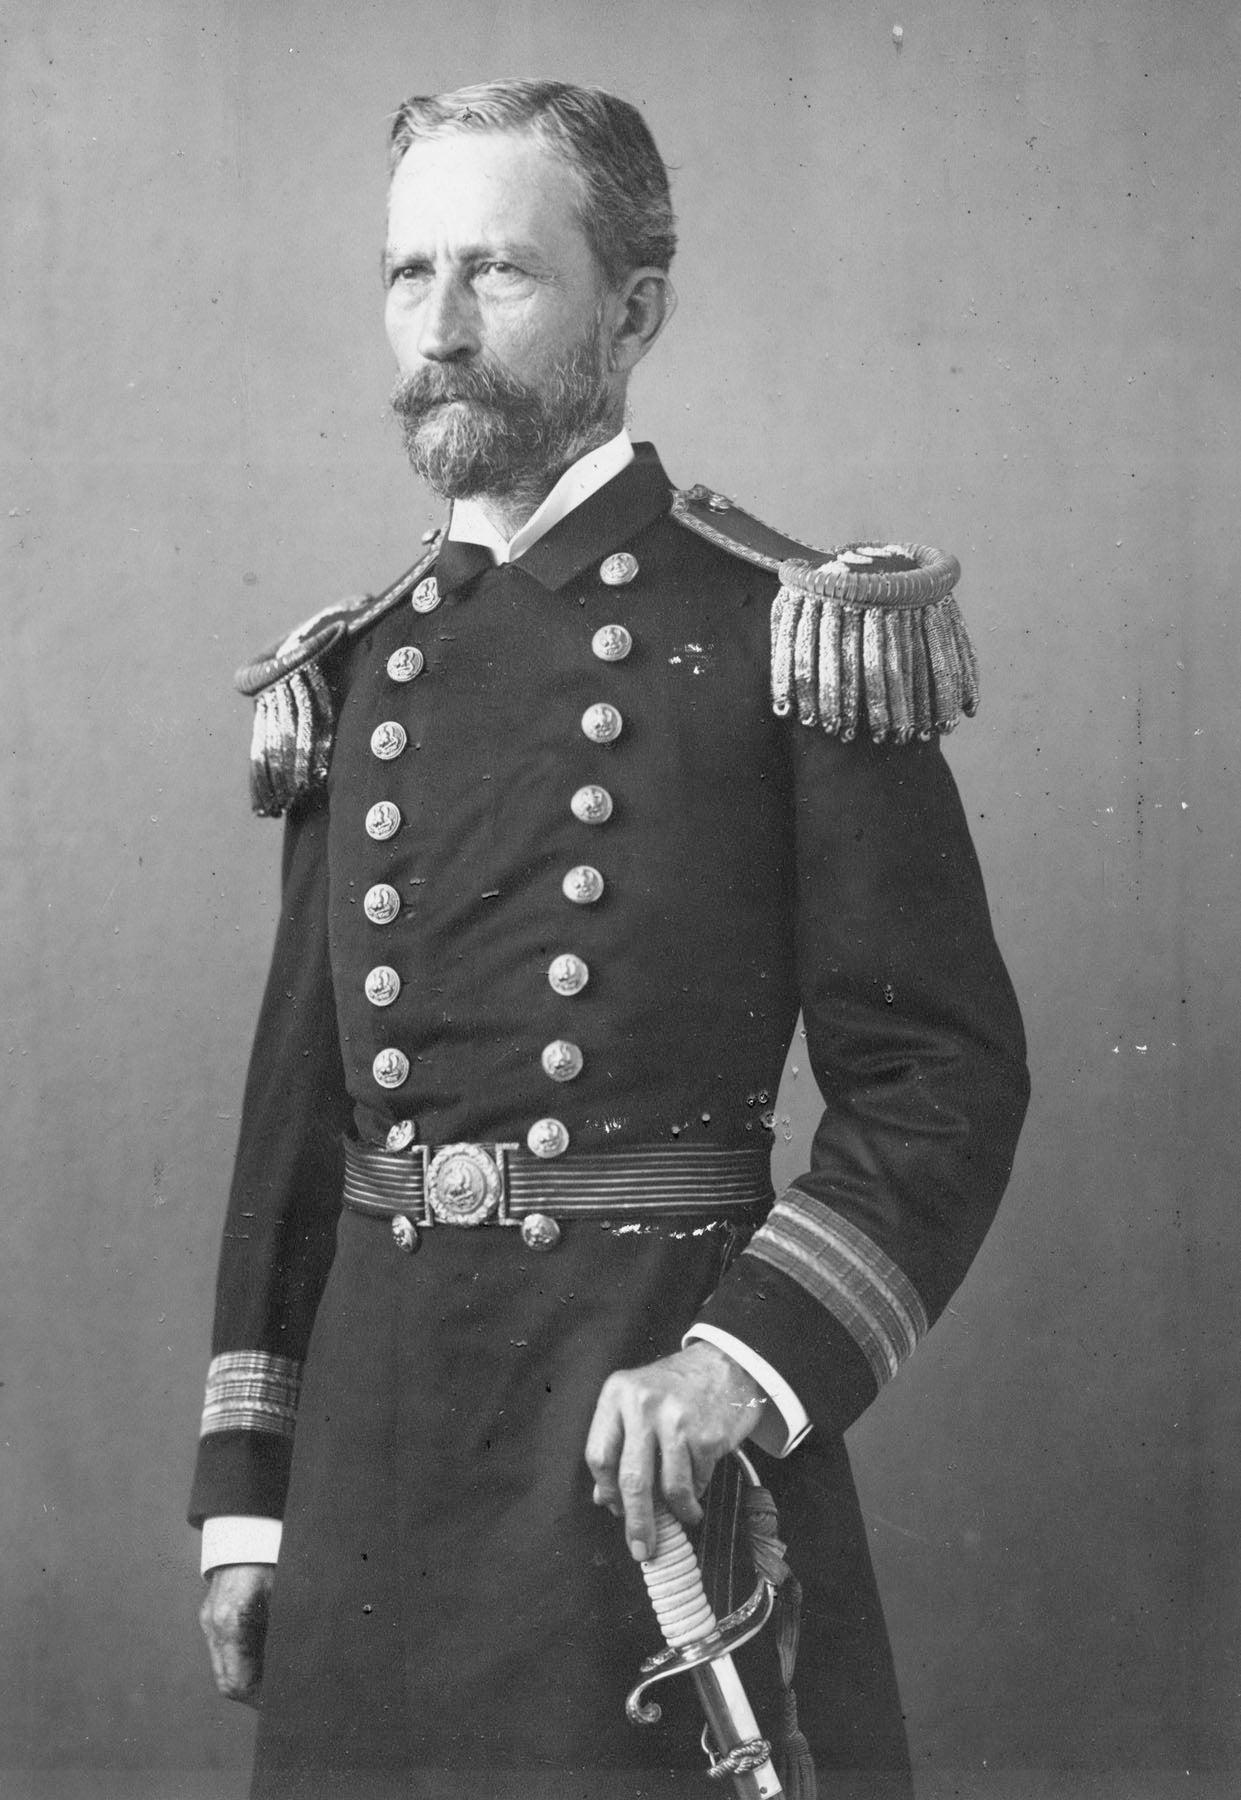 Aniceto Garcia Menocal, RPI Class of 1862